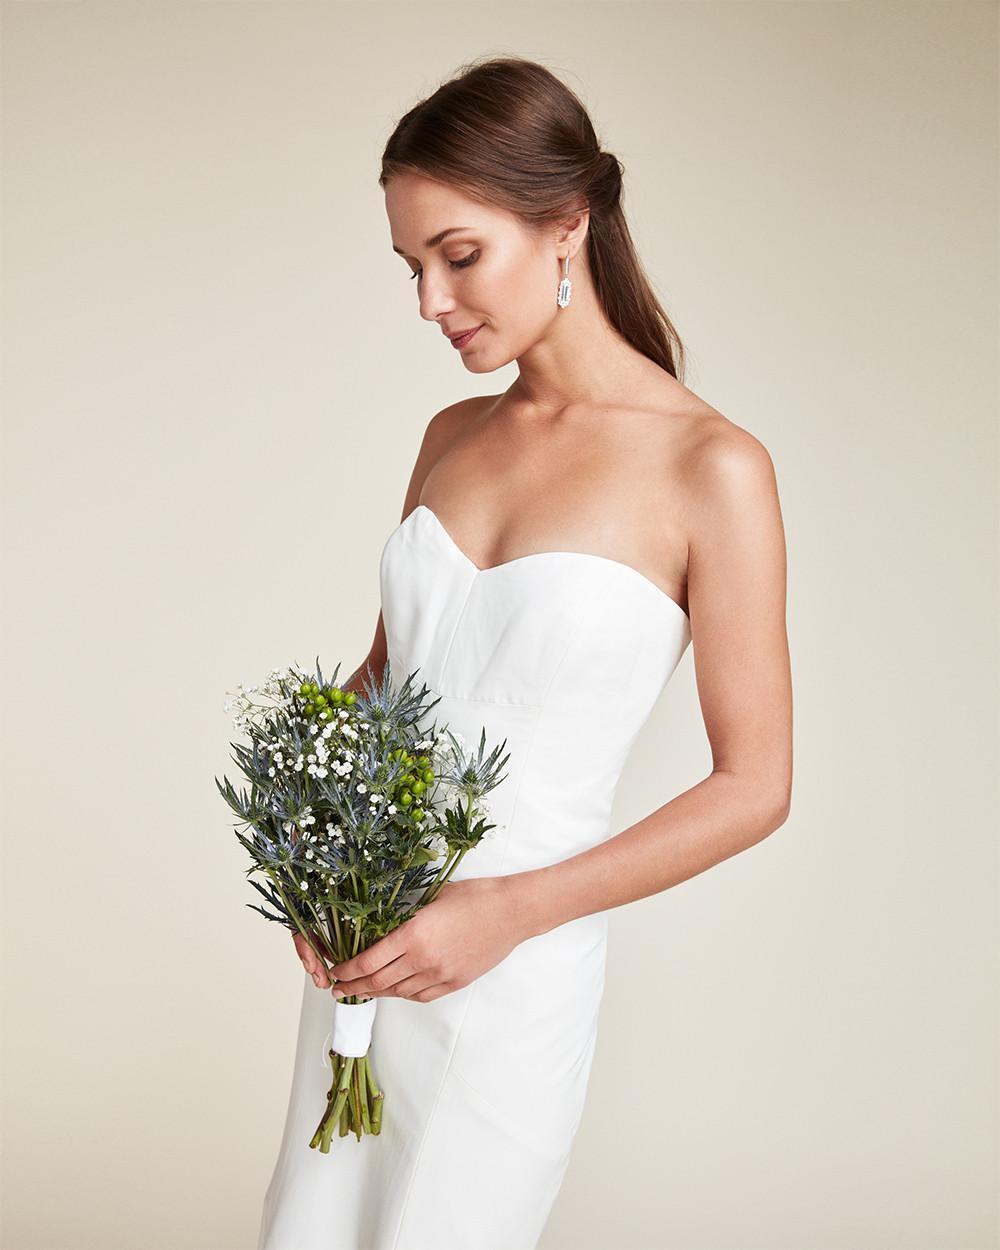 Lyst - Nicole Miller Dakota Bridal Gown in White